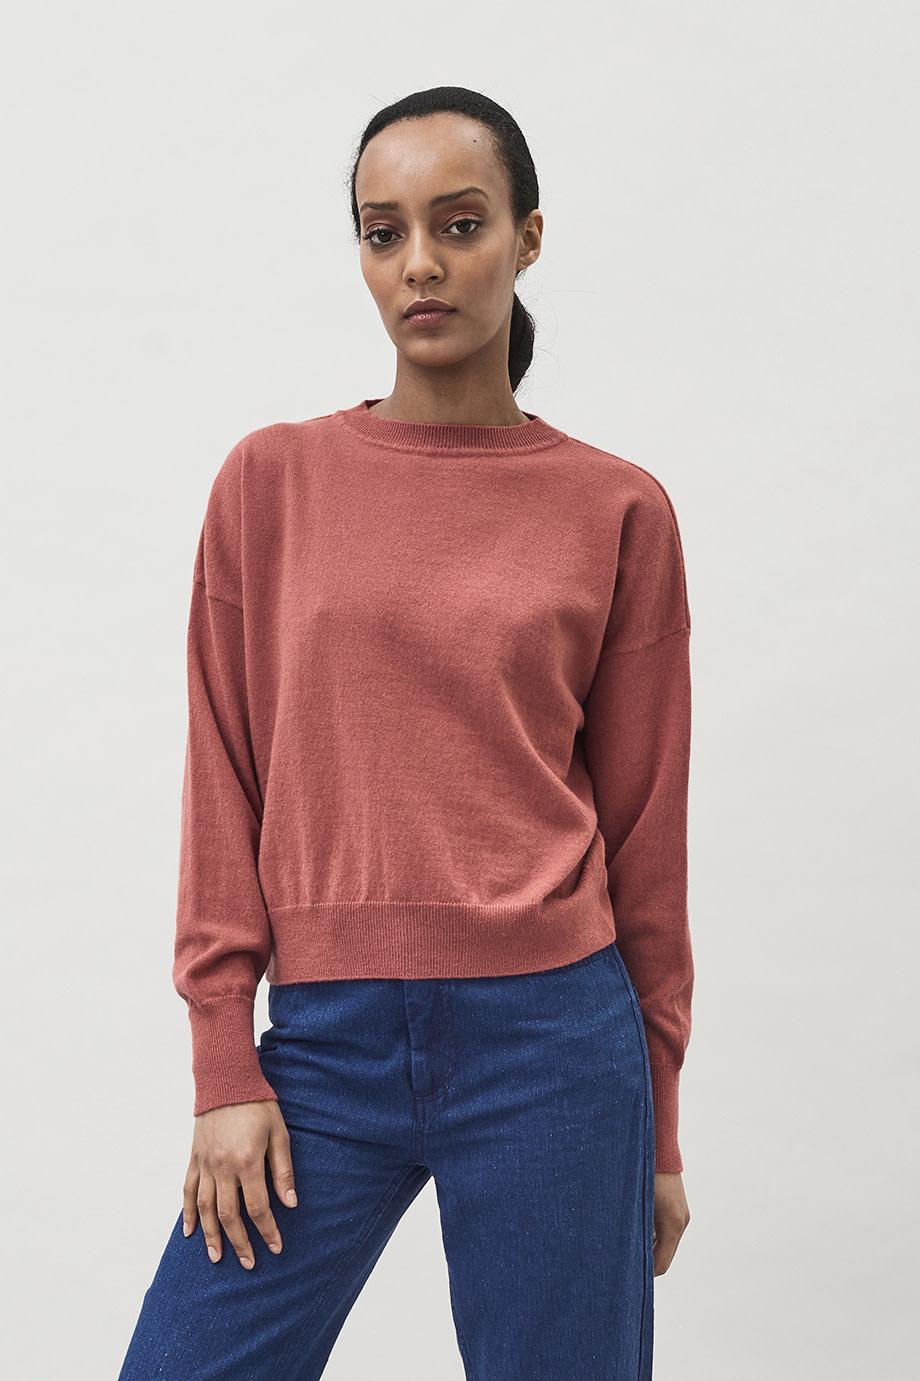 Ior Short Boxy Sweater - Dusty Pink